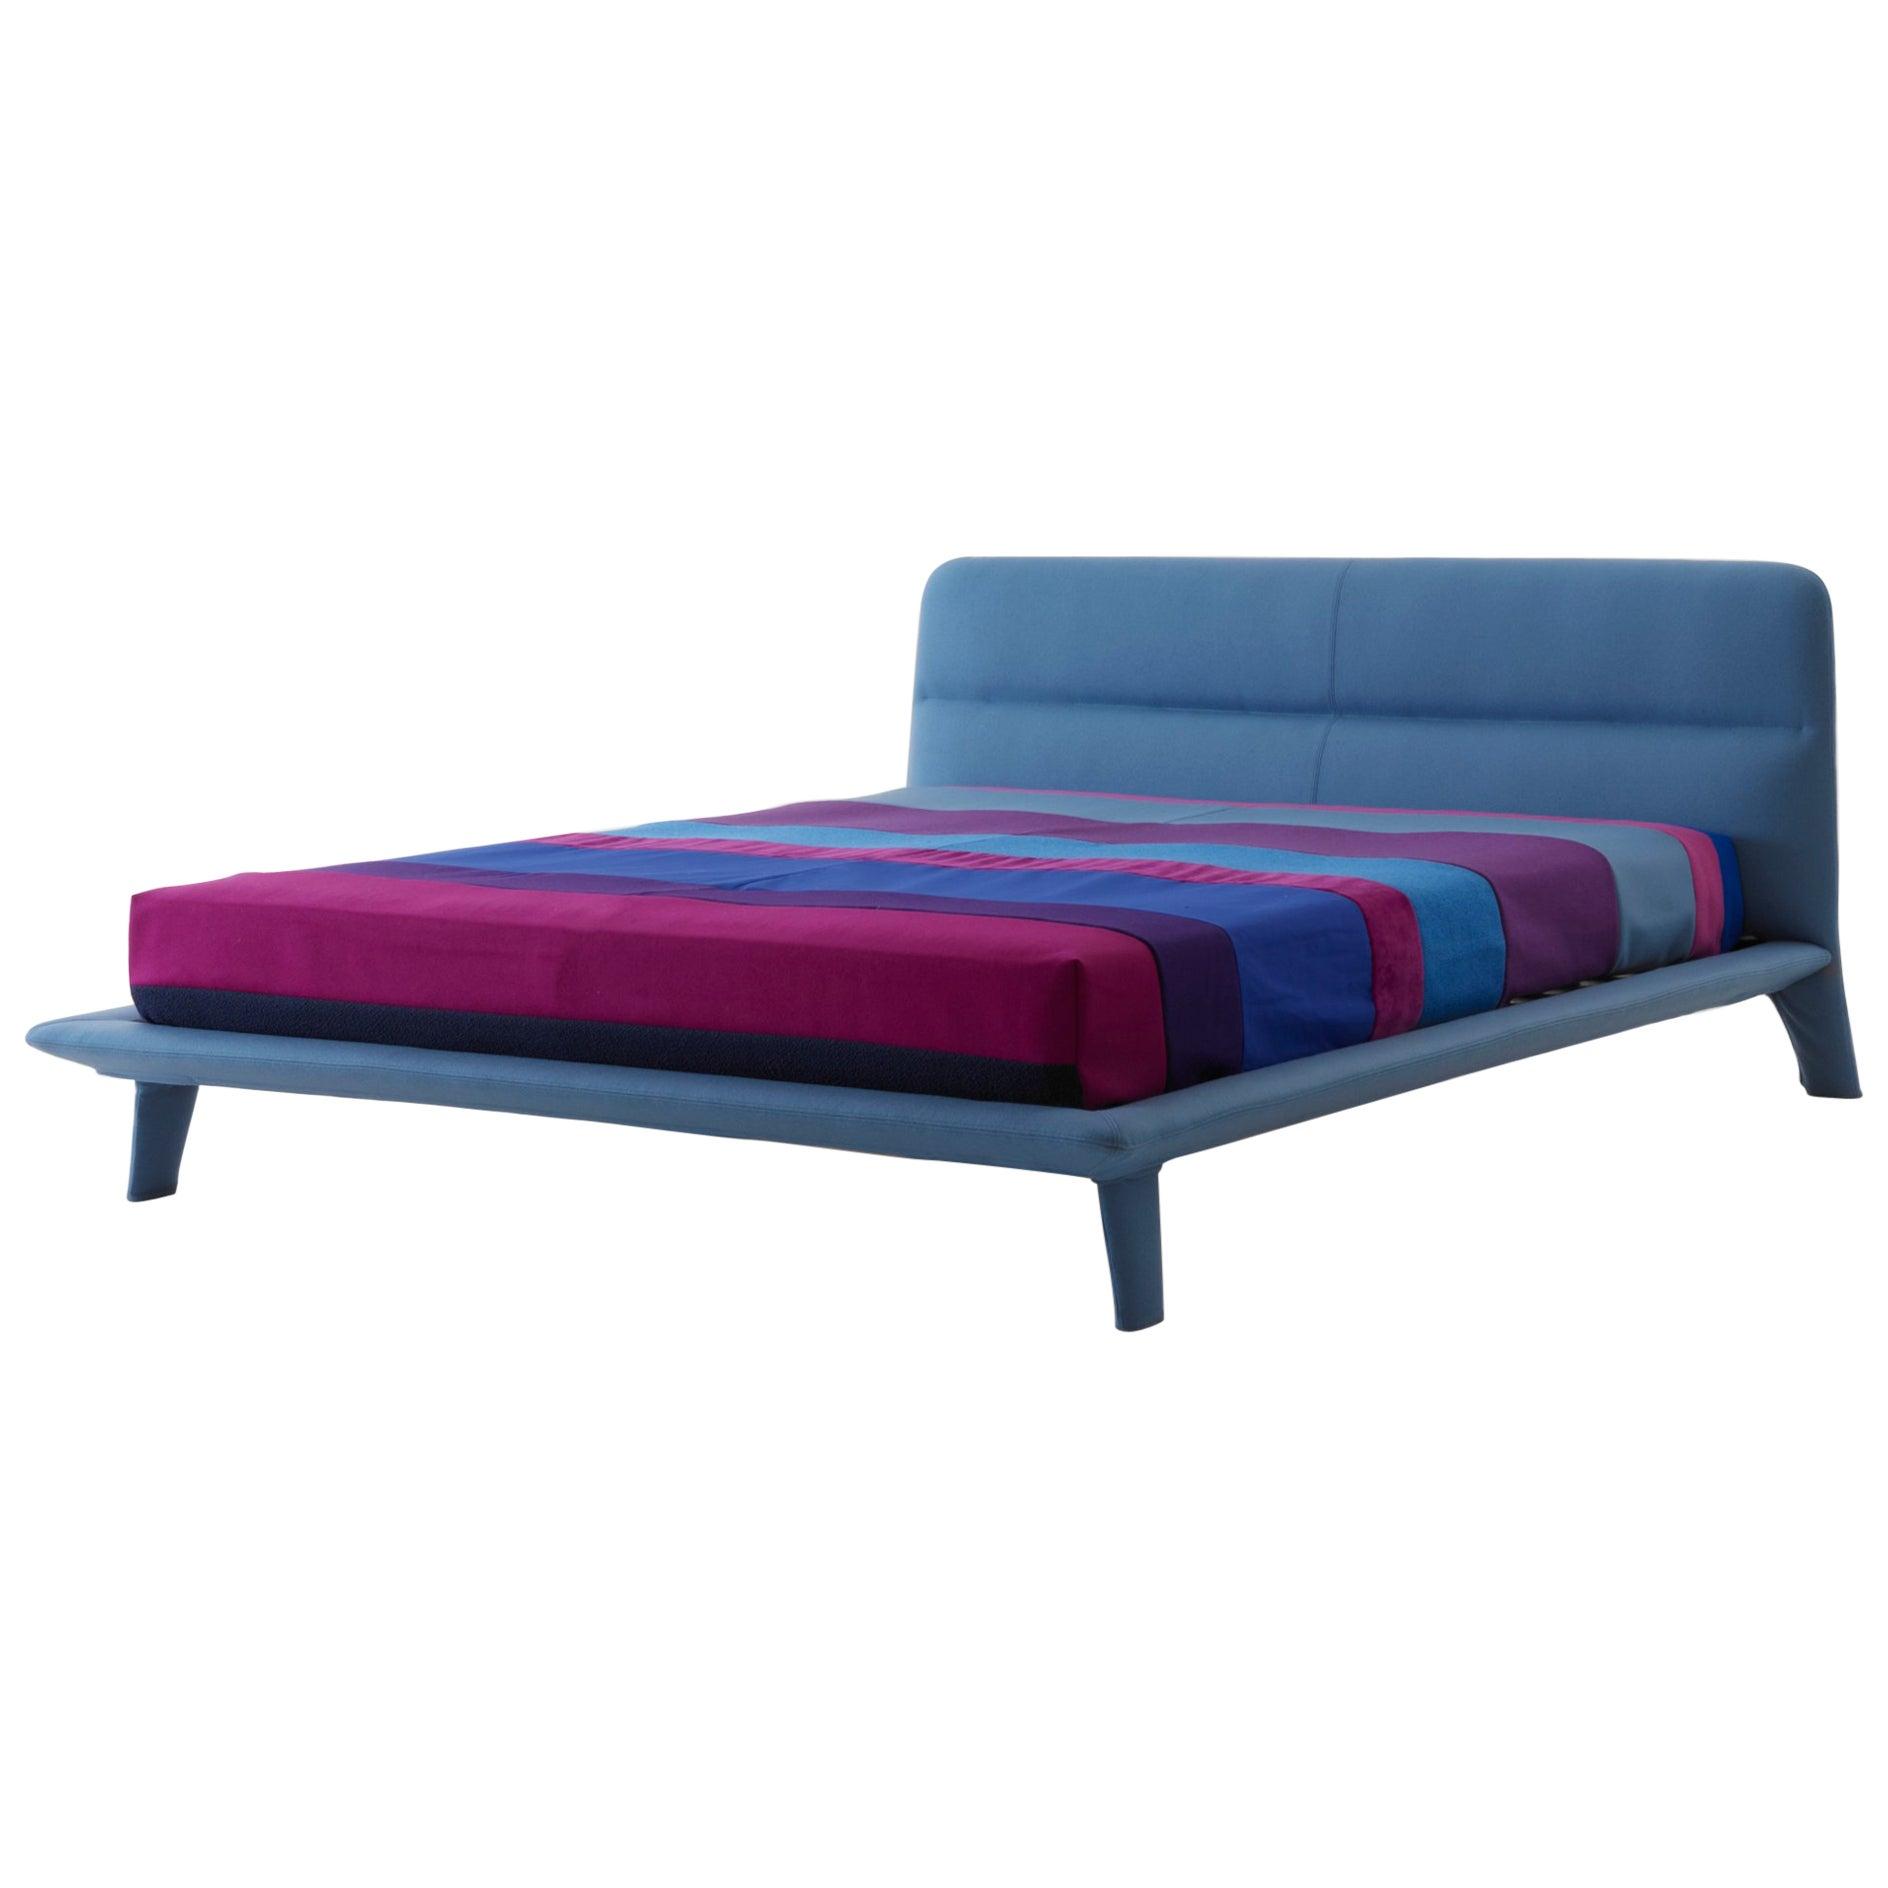 Nube Italia Amos Bed in Blue Upholstery by Mario Ferrarini